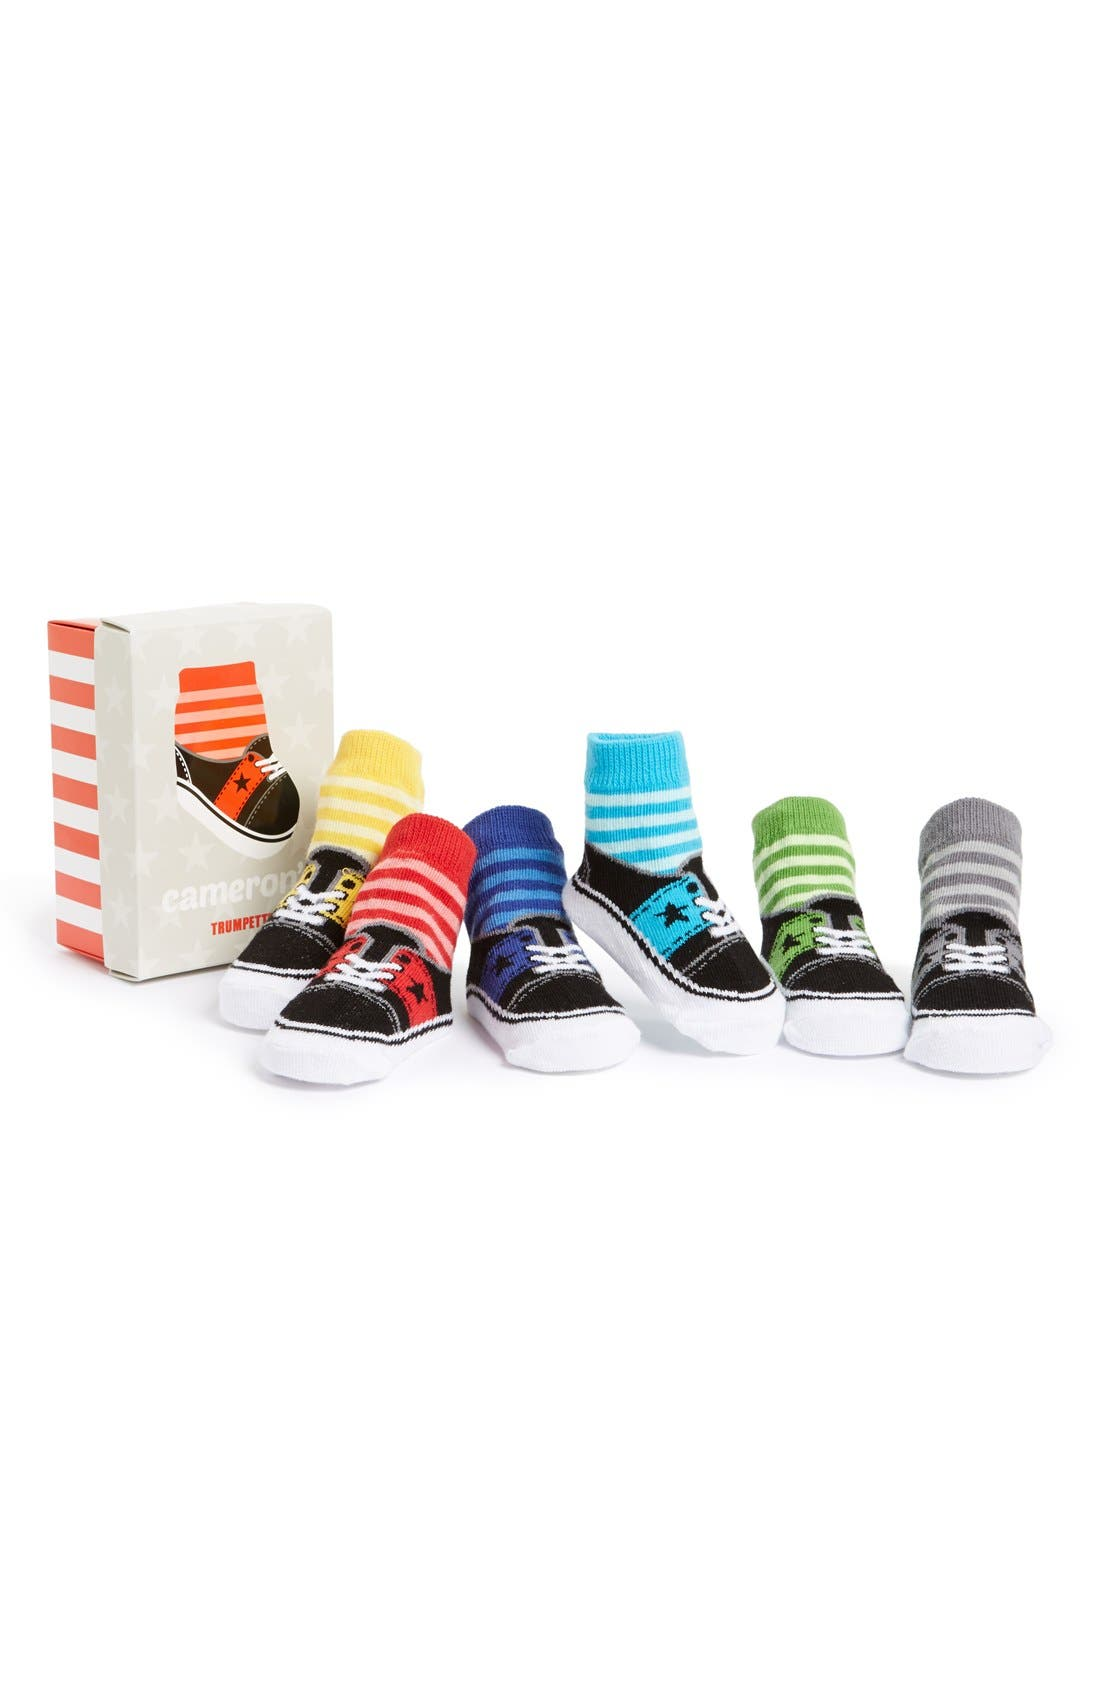 Main Image - Trumpette Cameron 6-Pack Socks (Baby Boys)